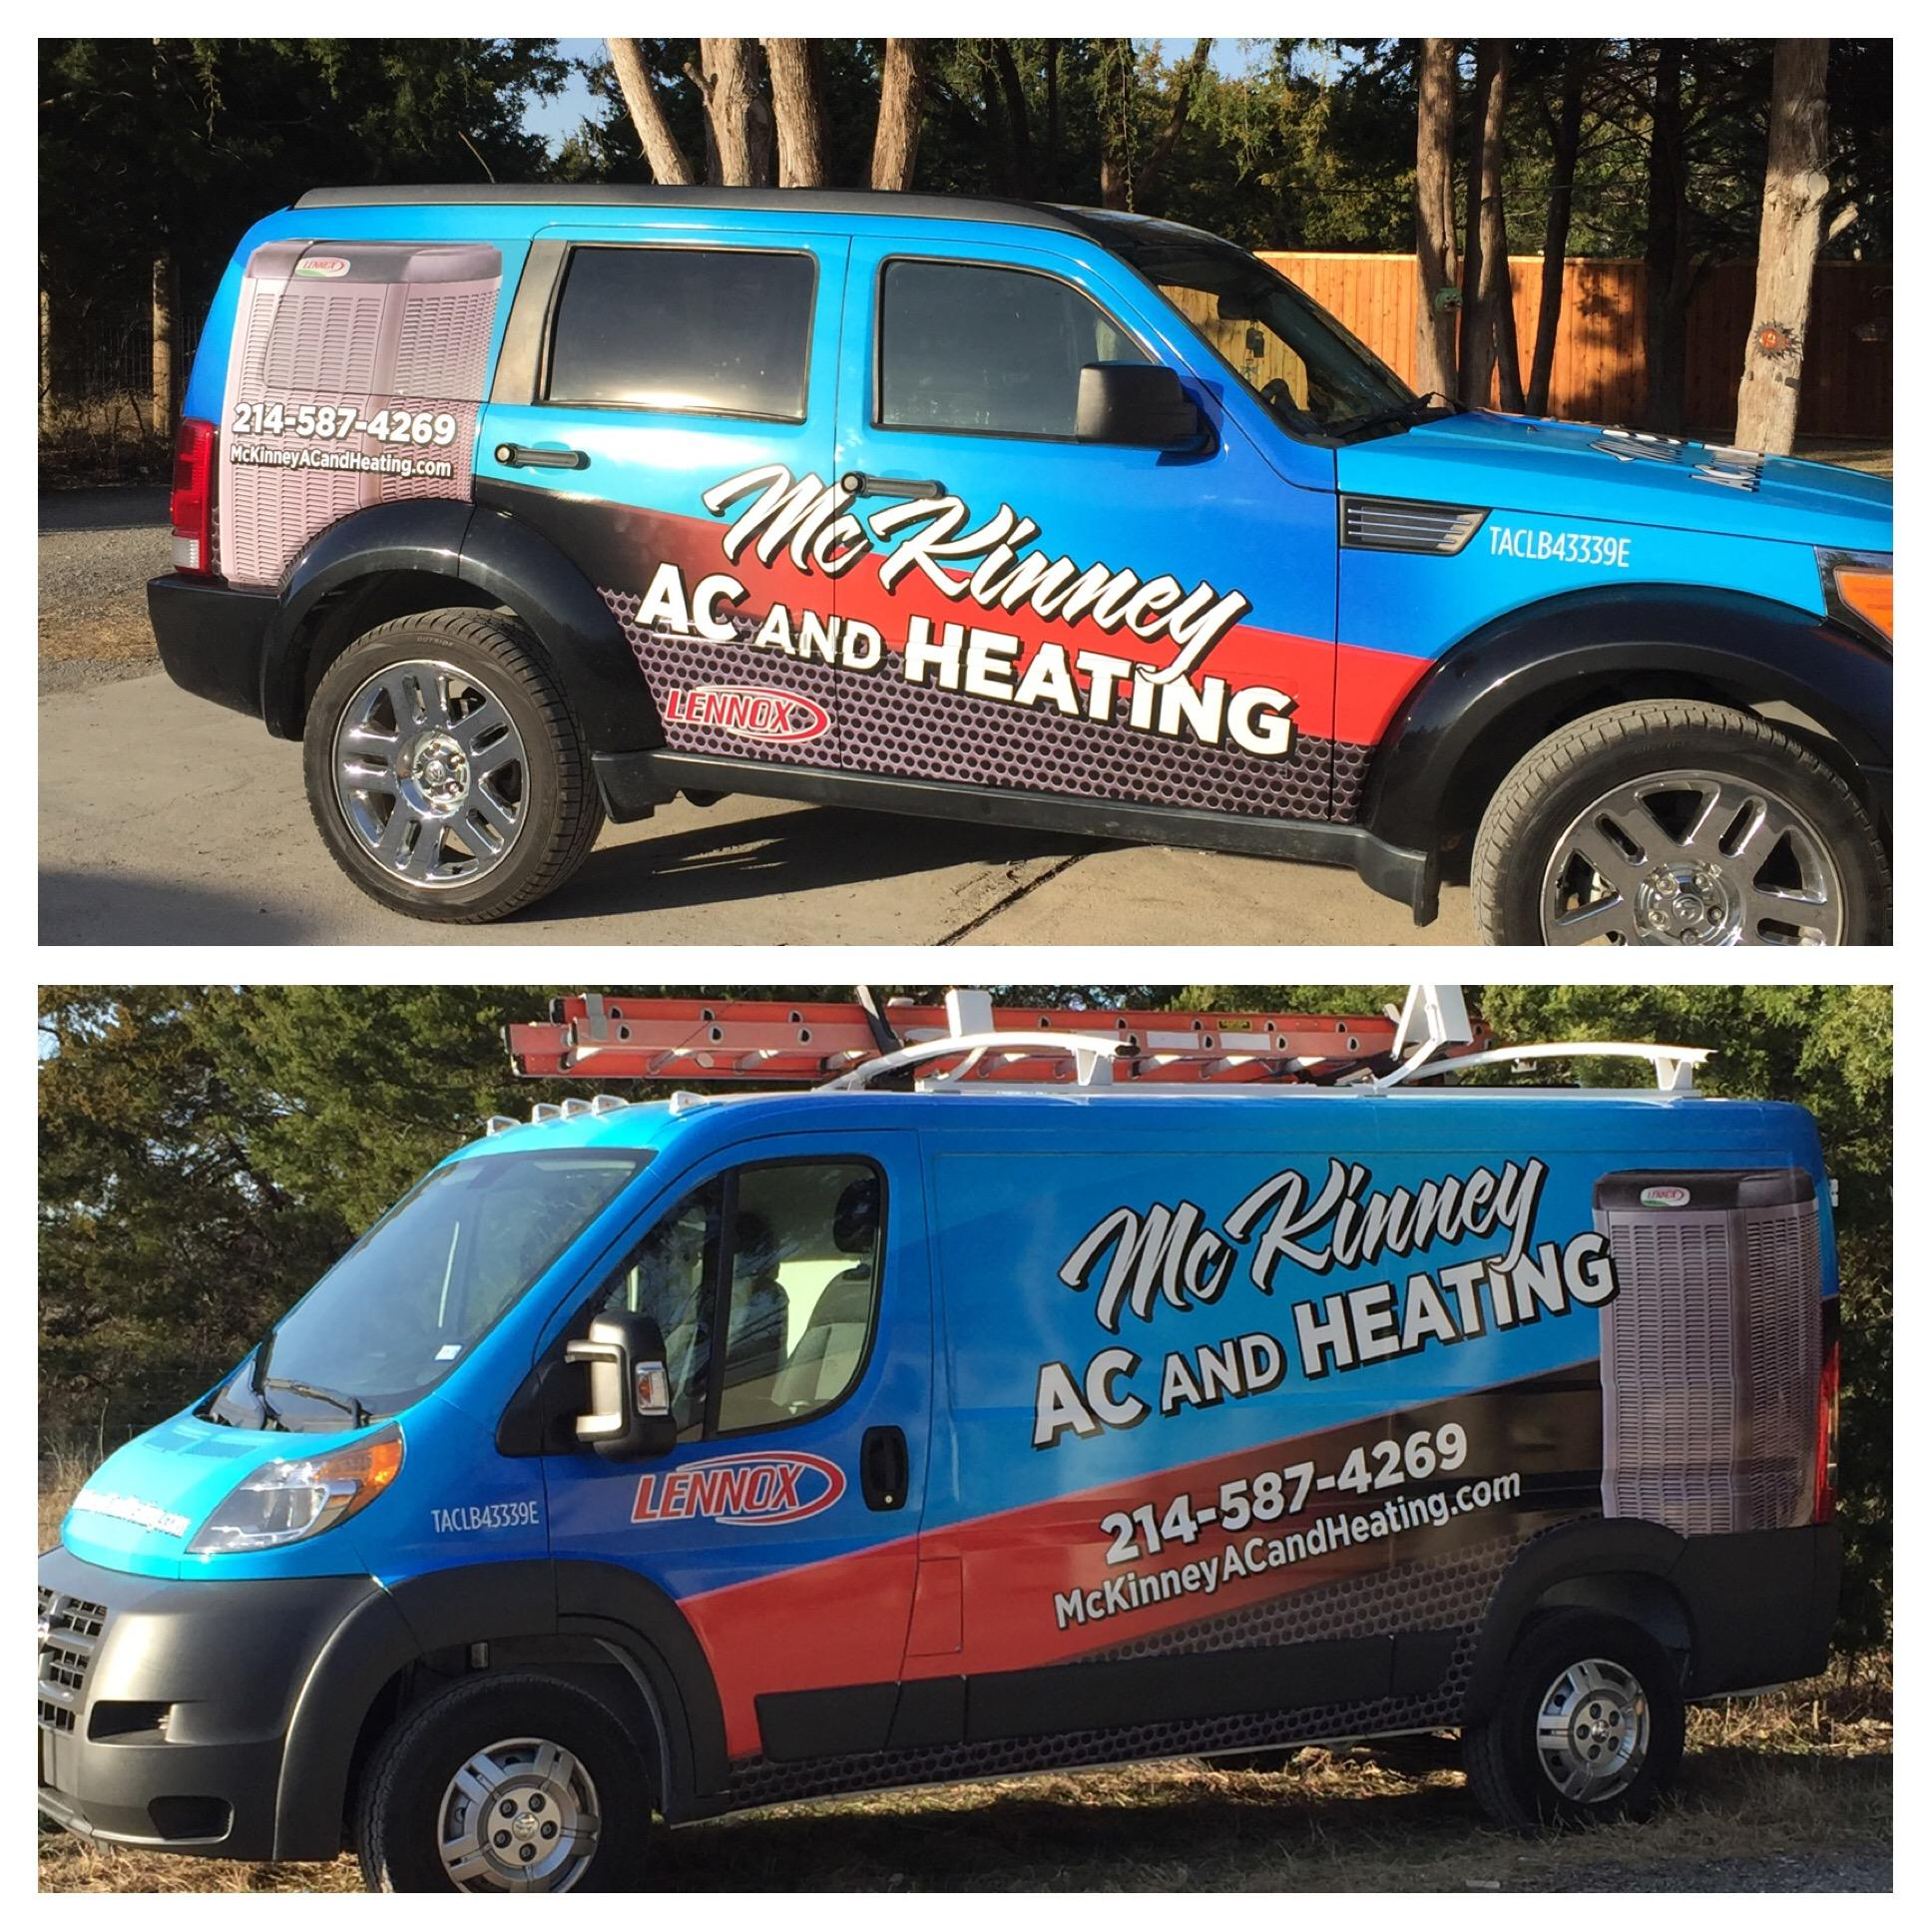 McKinney AC & Heating image 3